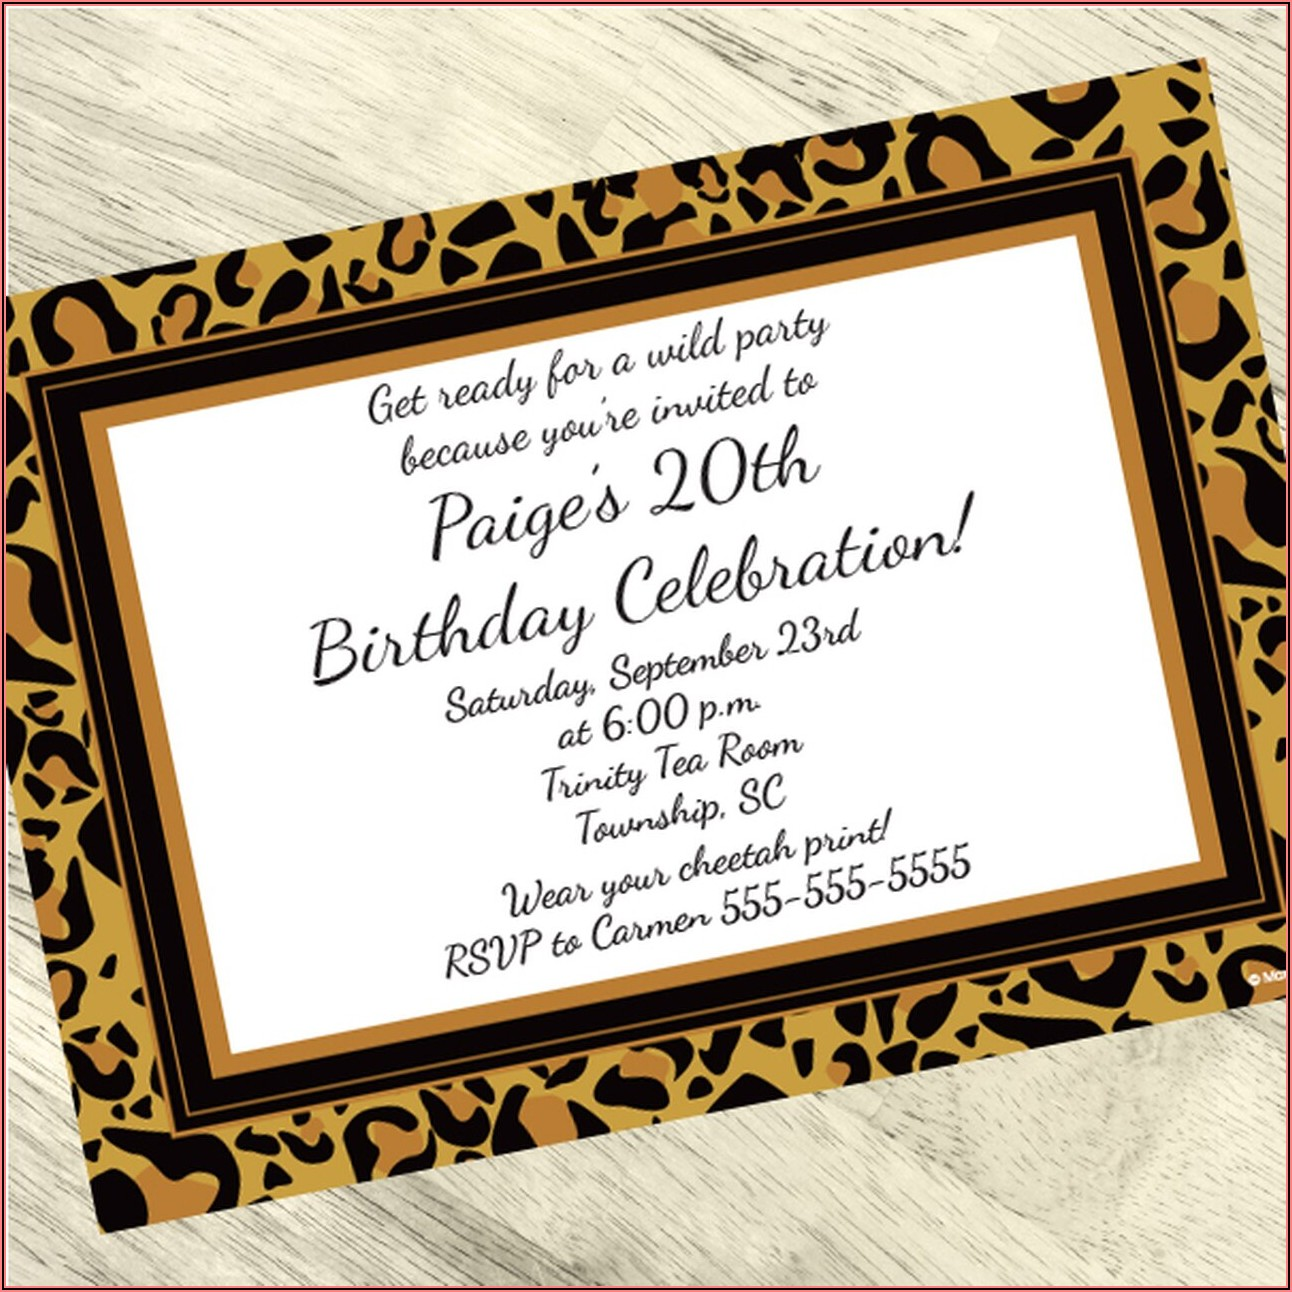 Cheetah Print Personalized Birthday Invitations